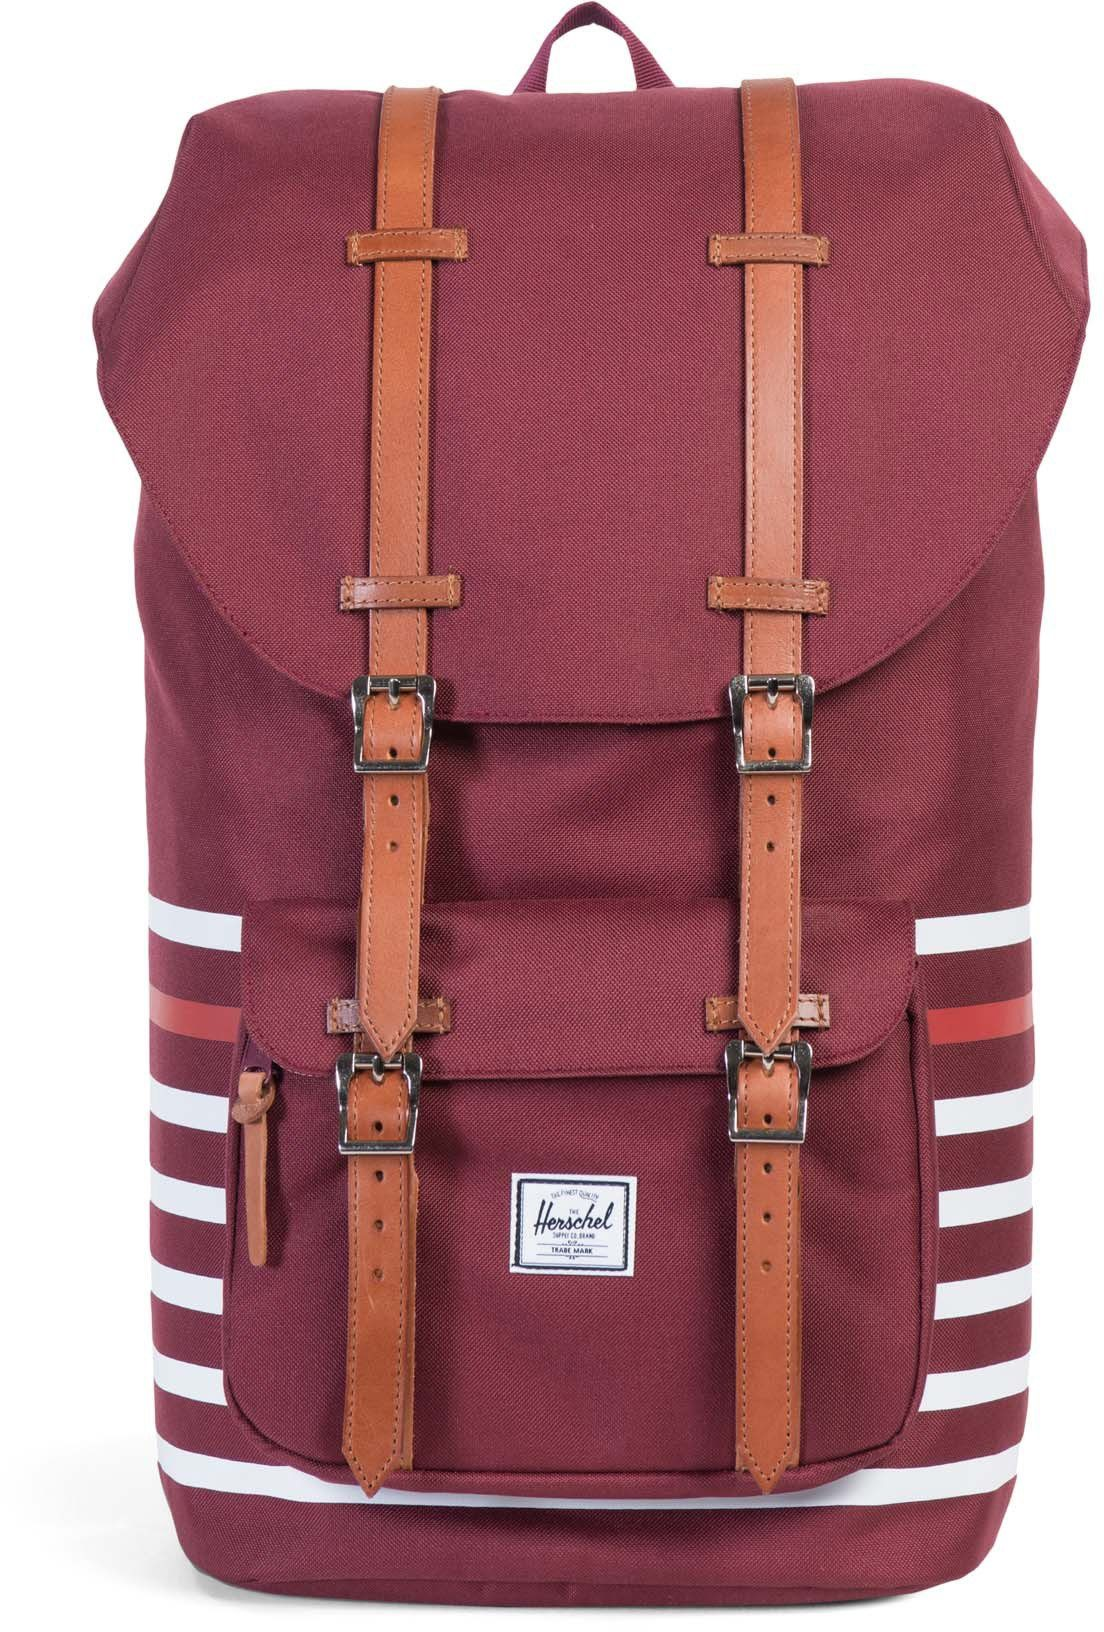 Herschel Rucksack mit Laptopfach/Lederriemen, »Little America Backpack, Windsor Wine Offset Stripe«